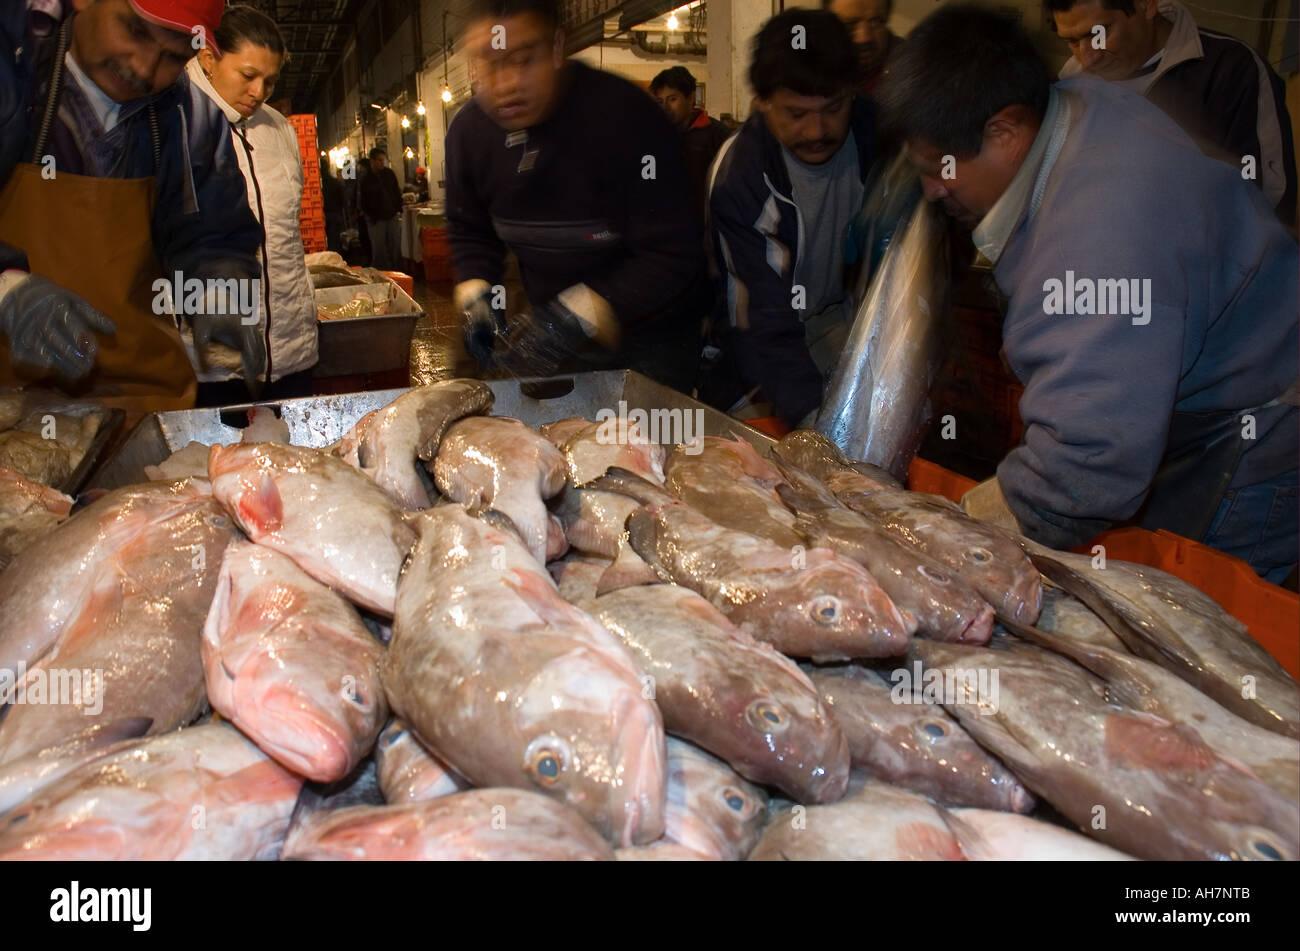 La Viga Mexico City s wholesale fish market Stock Photo: 8220490 - Alamy